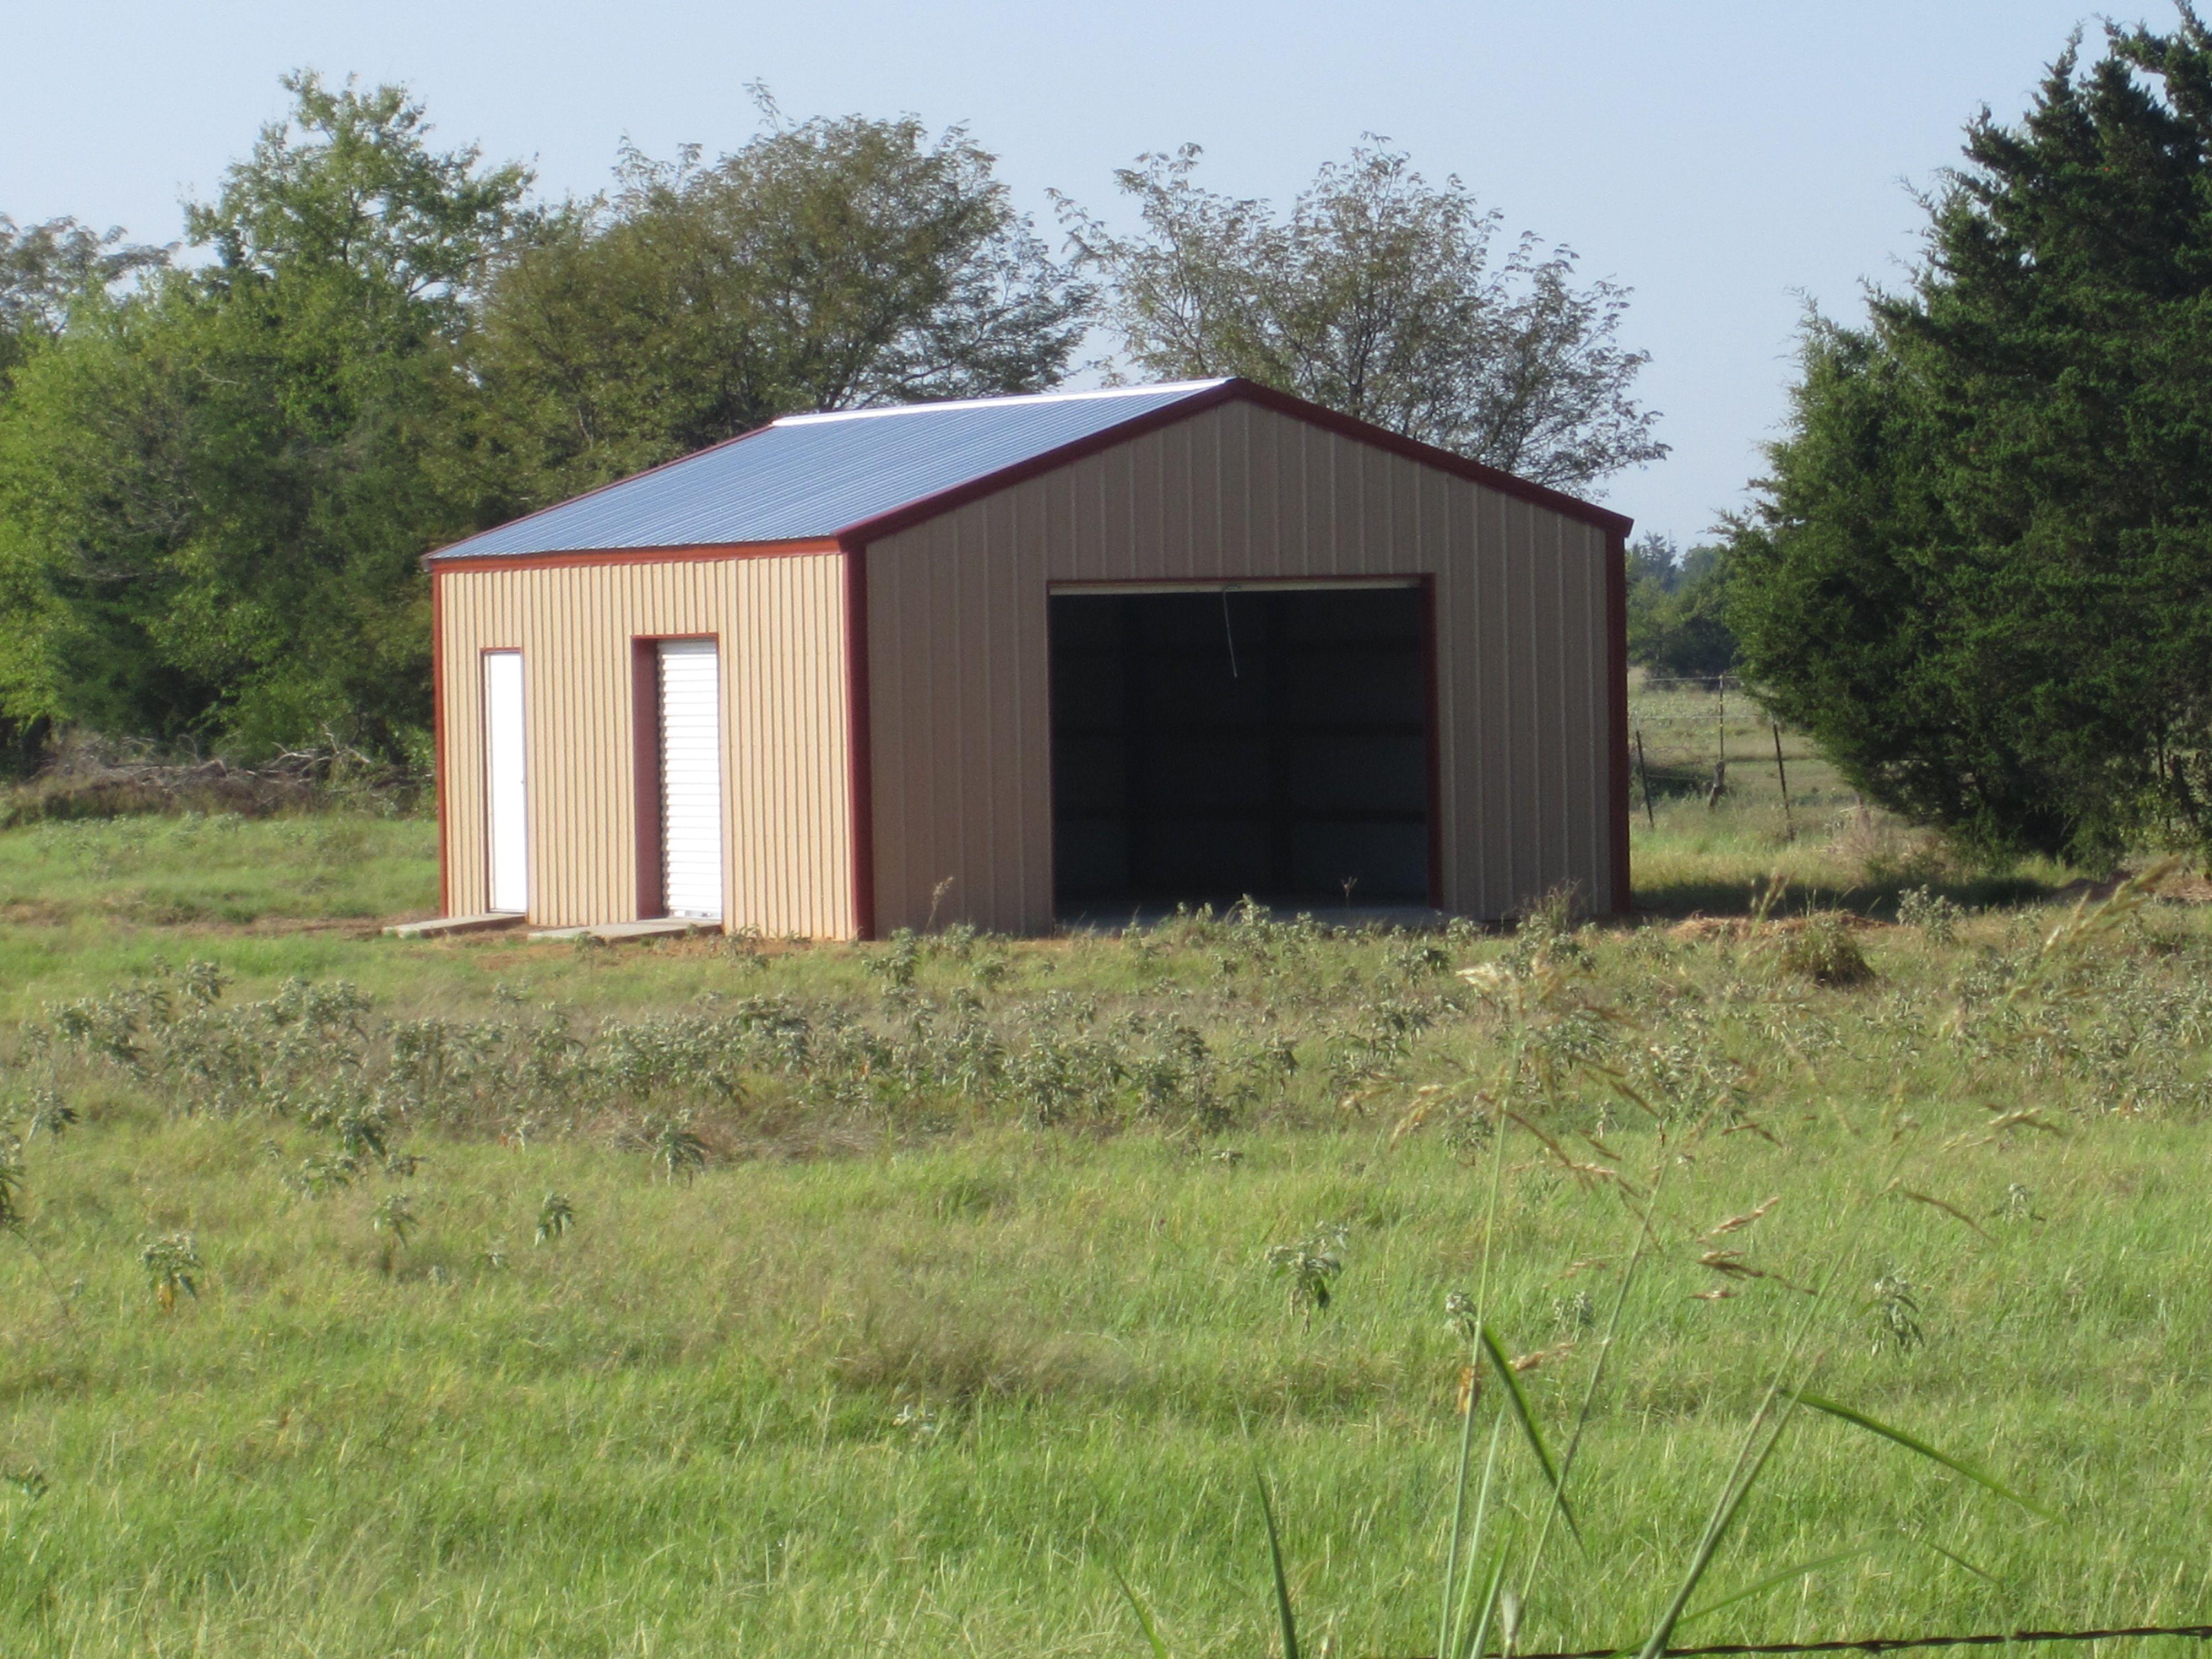 Ark La Tex Pole Barn Quality Barns And Buildings Custom Portable